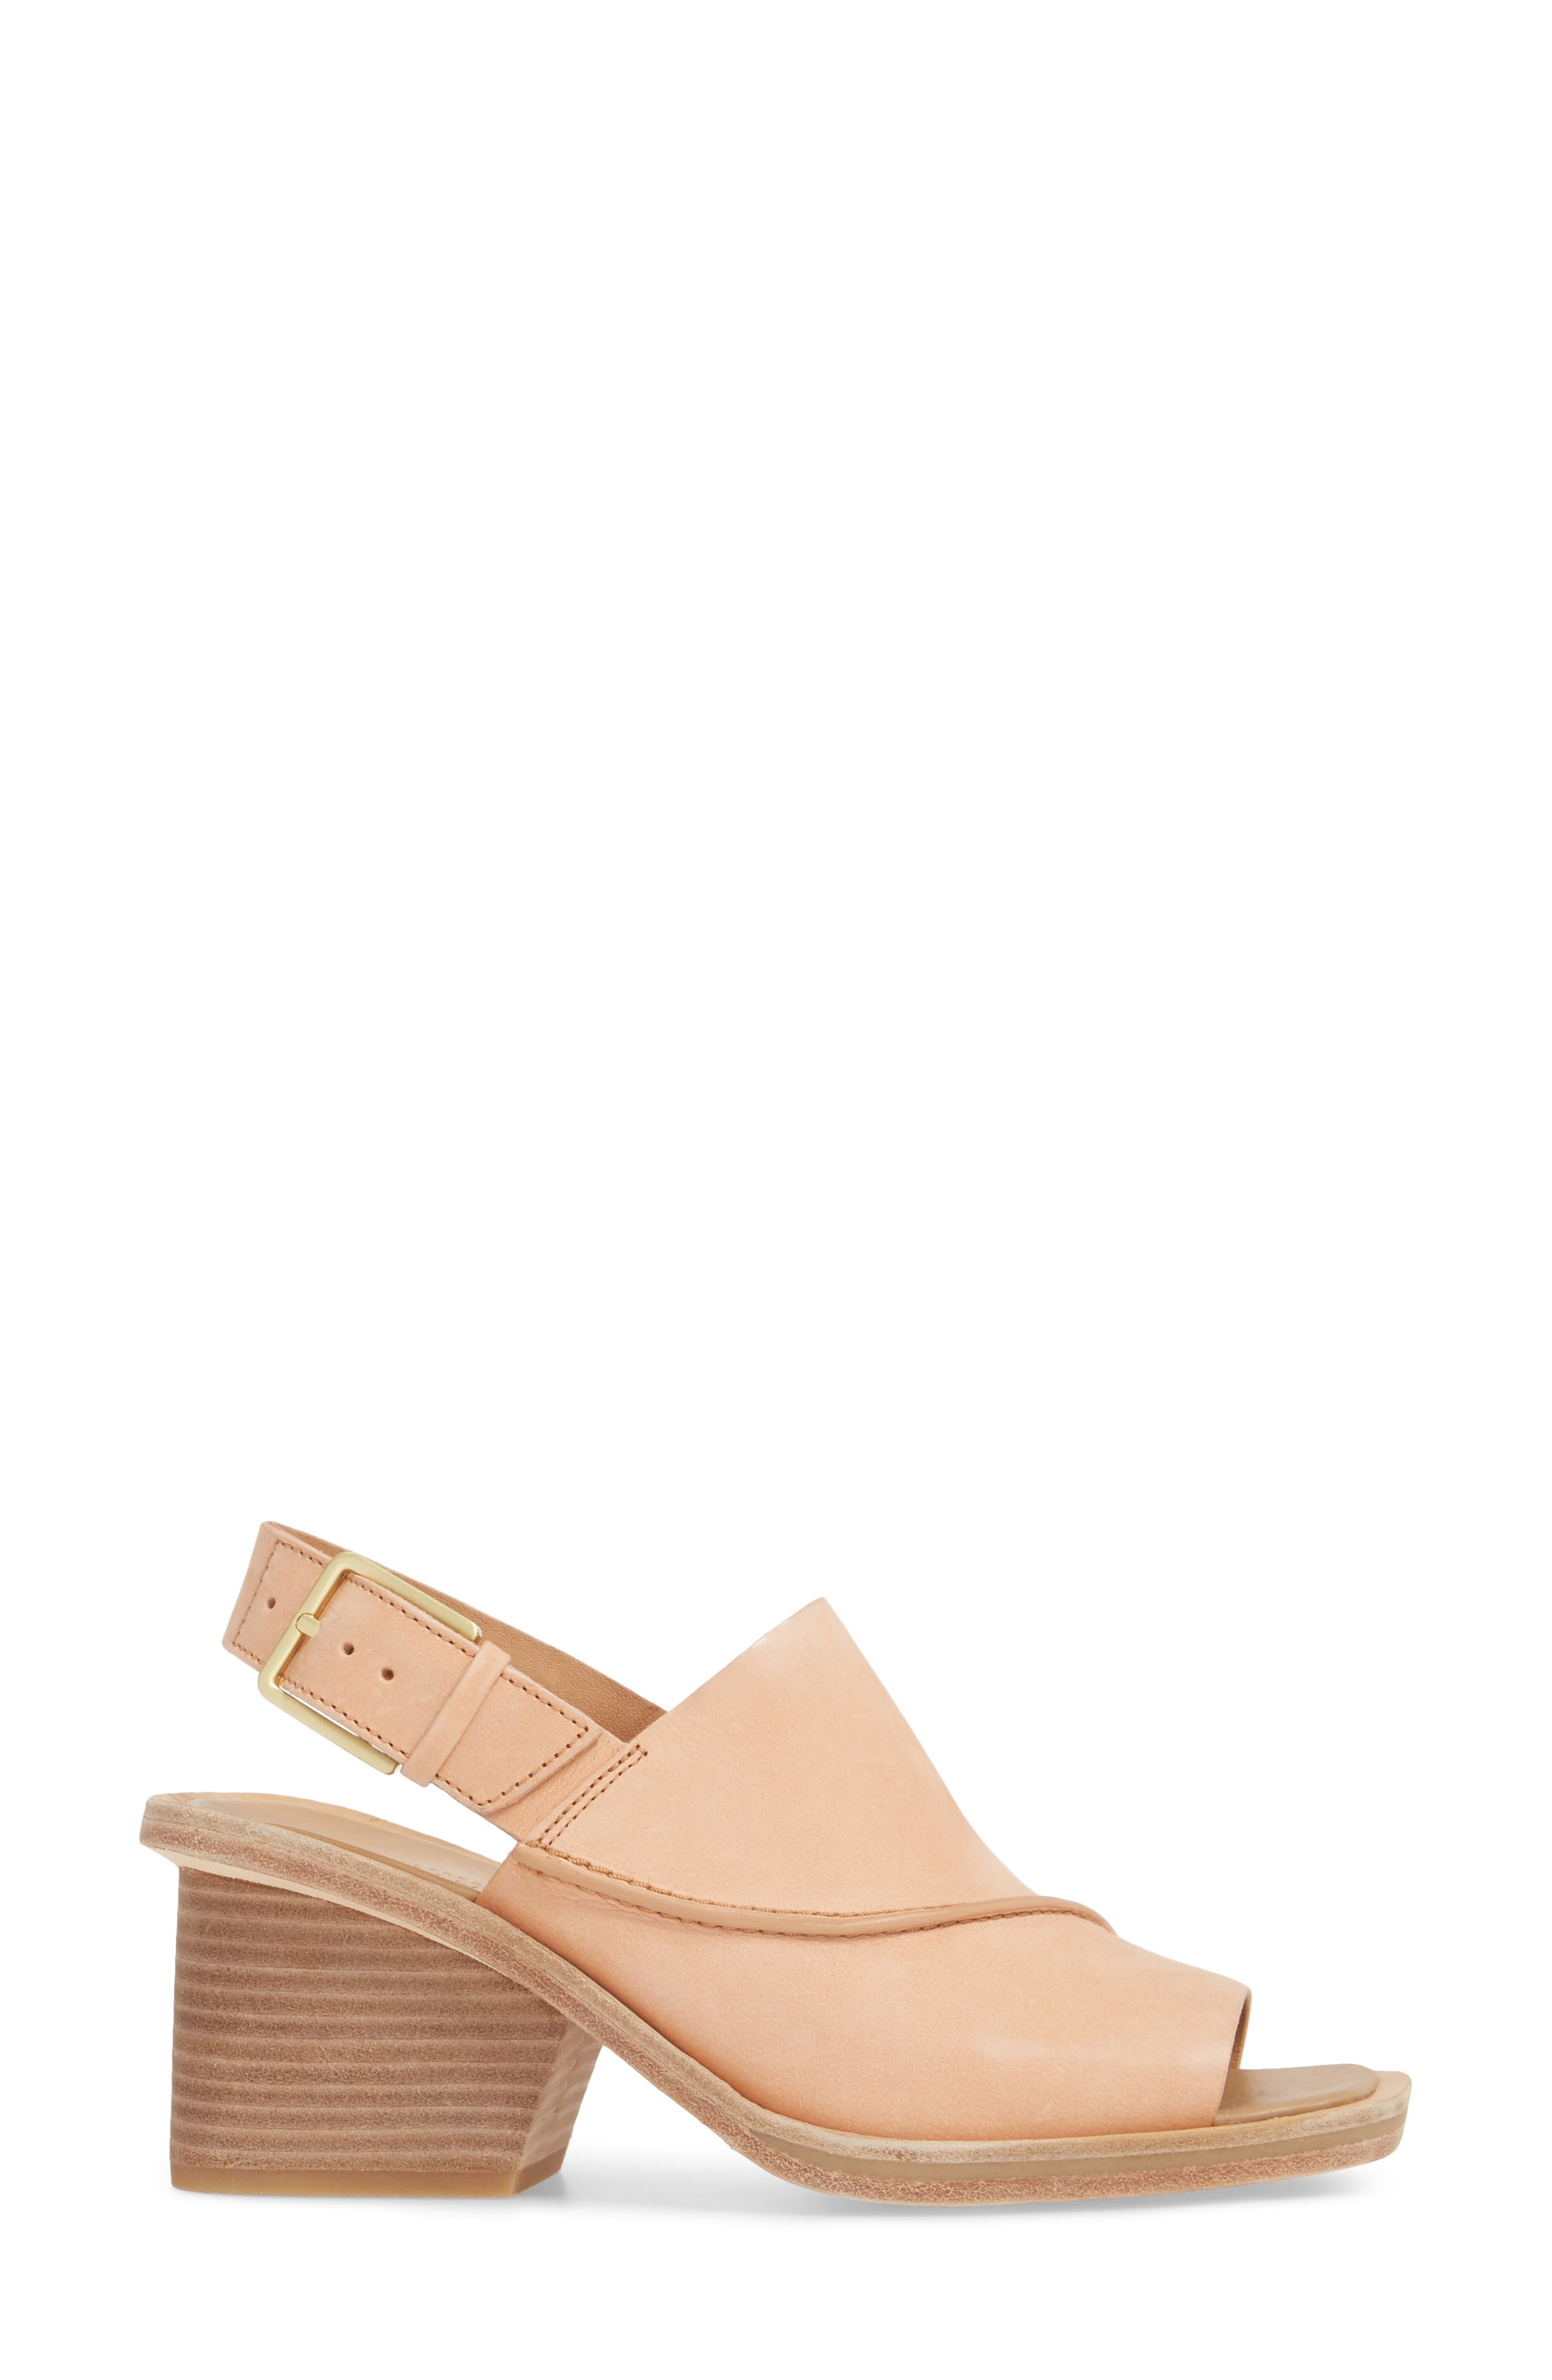 Clarks Bermudan Block Heel Sandal,                             Alternate thumbnail 3, color,                             Sandstone Nubuck Leather